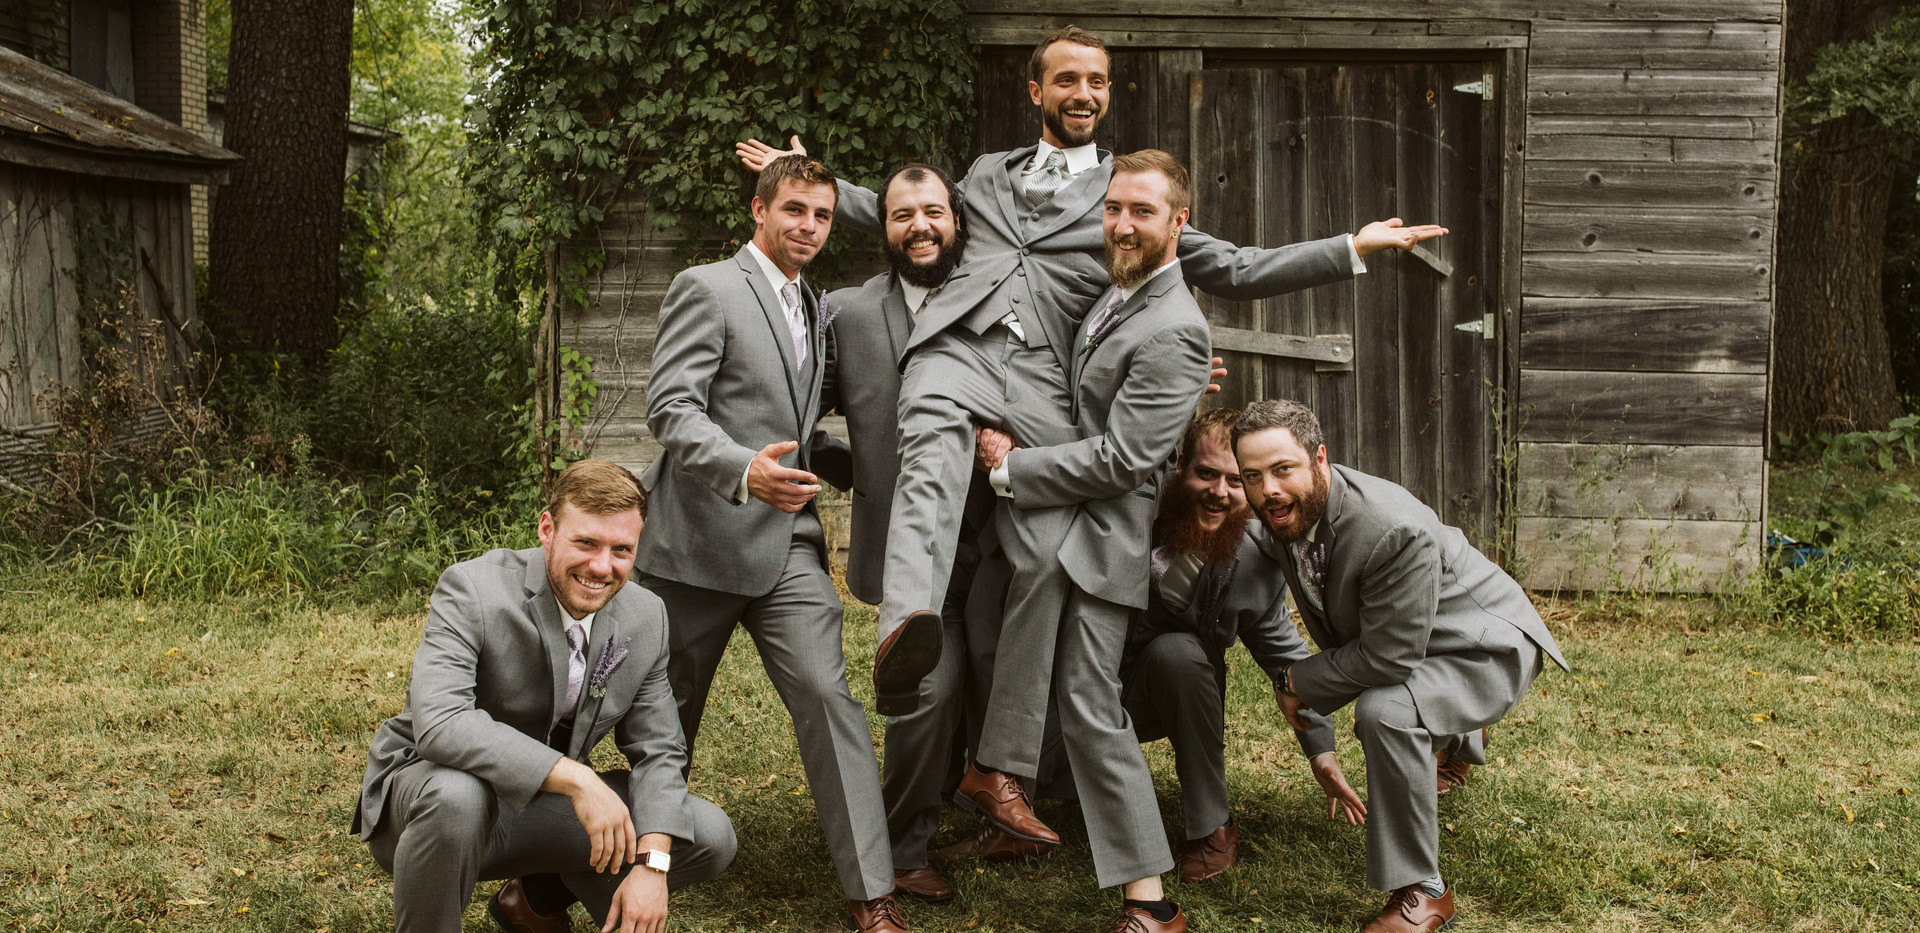 Authentic Wedding Photography.jpg